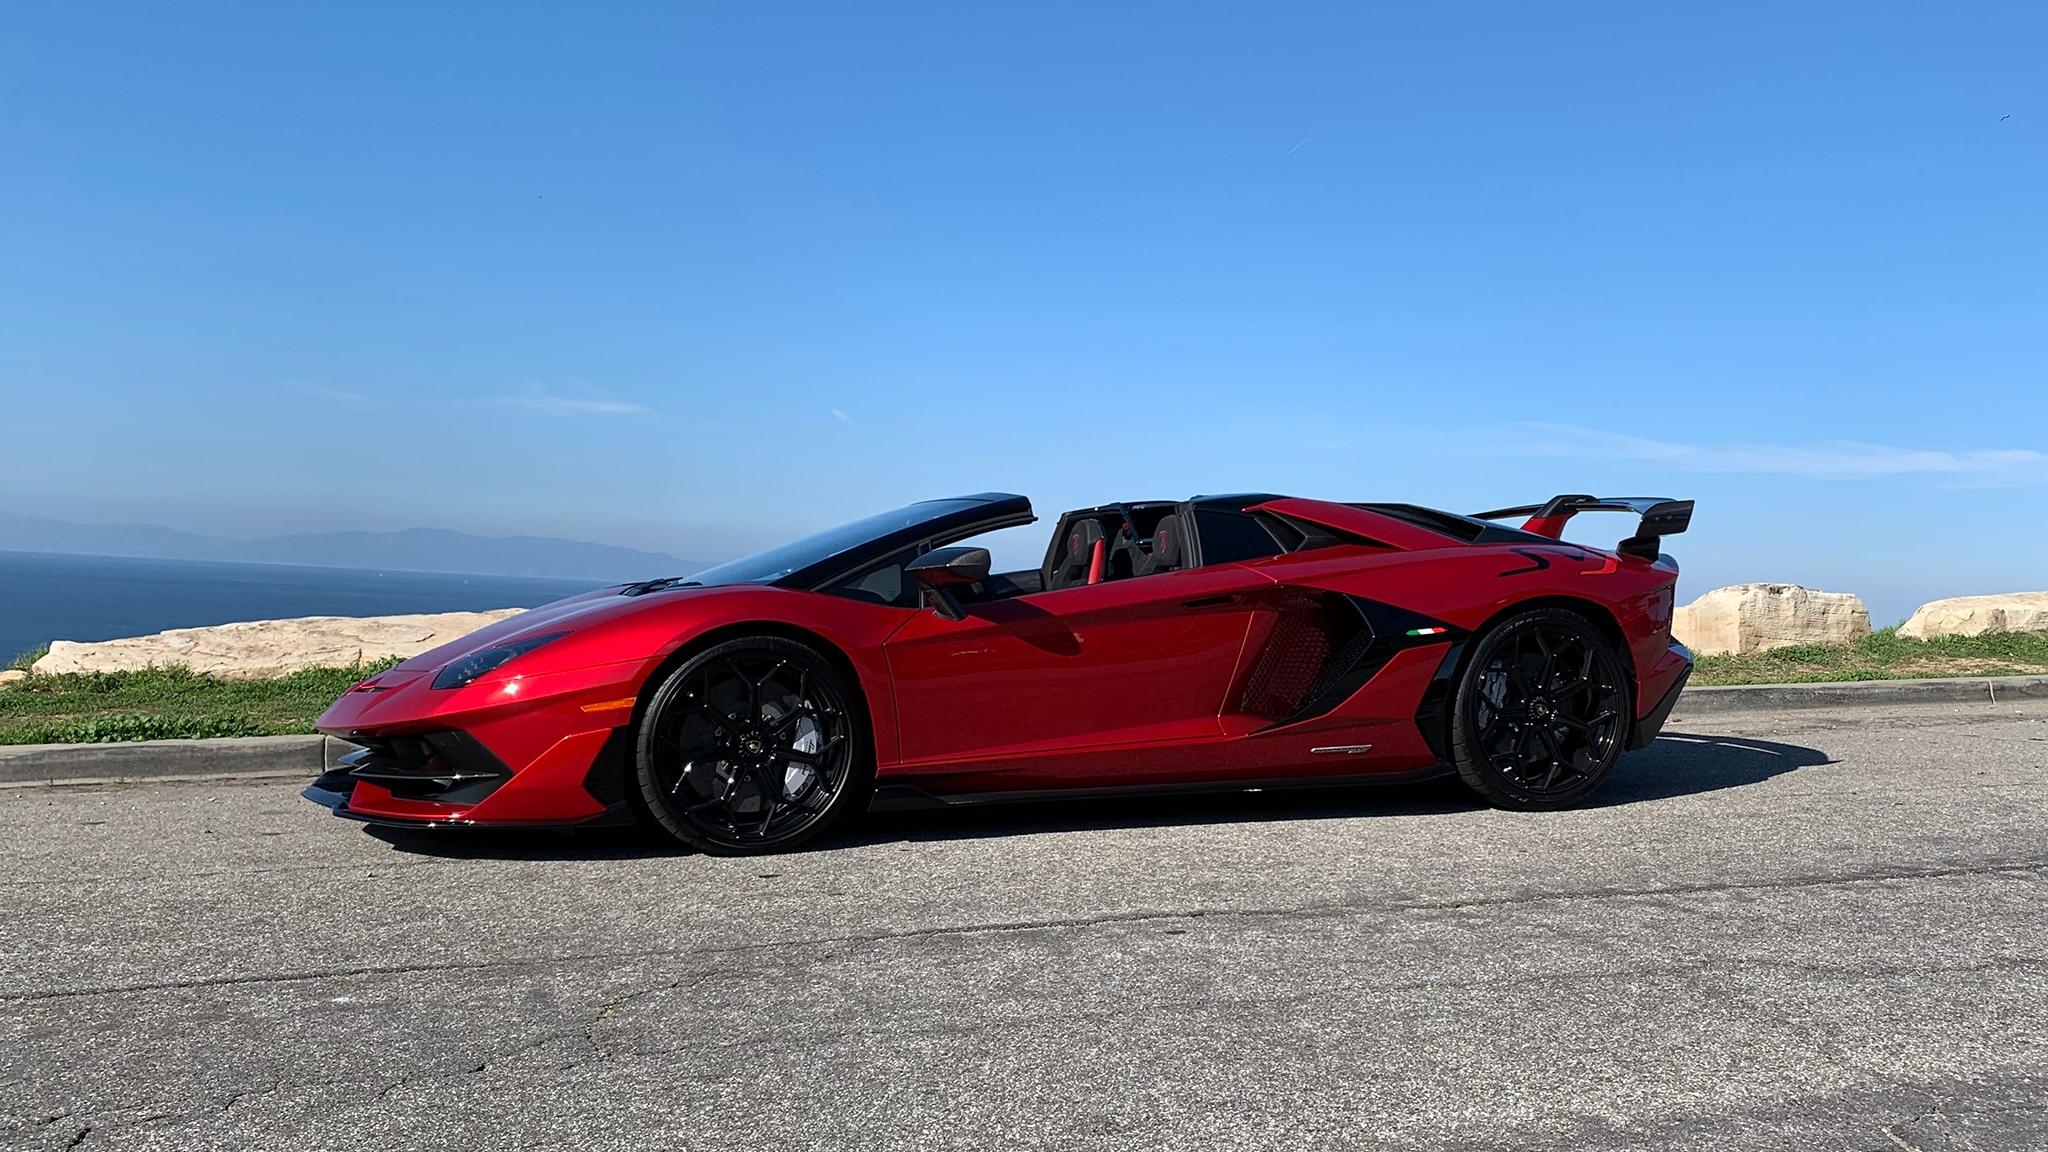 The Lamborghini Aventador SVJ Roadster is One Wild Open,Top